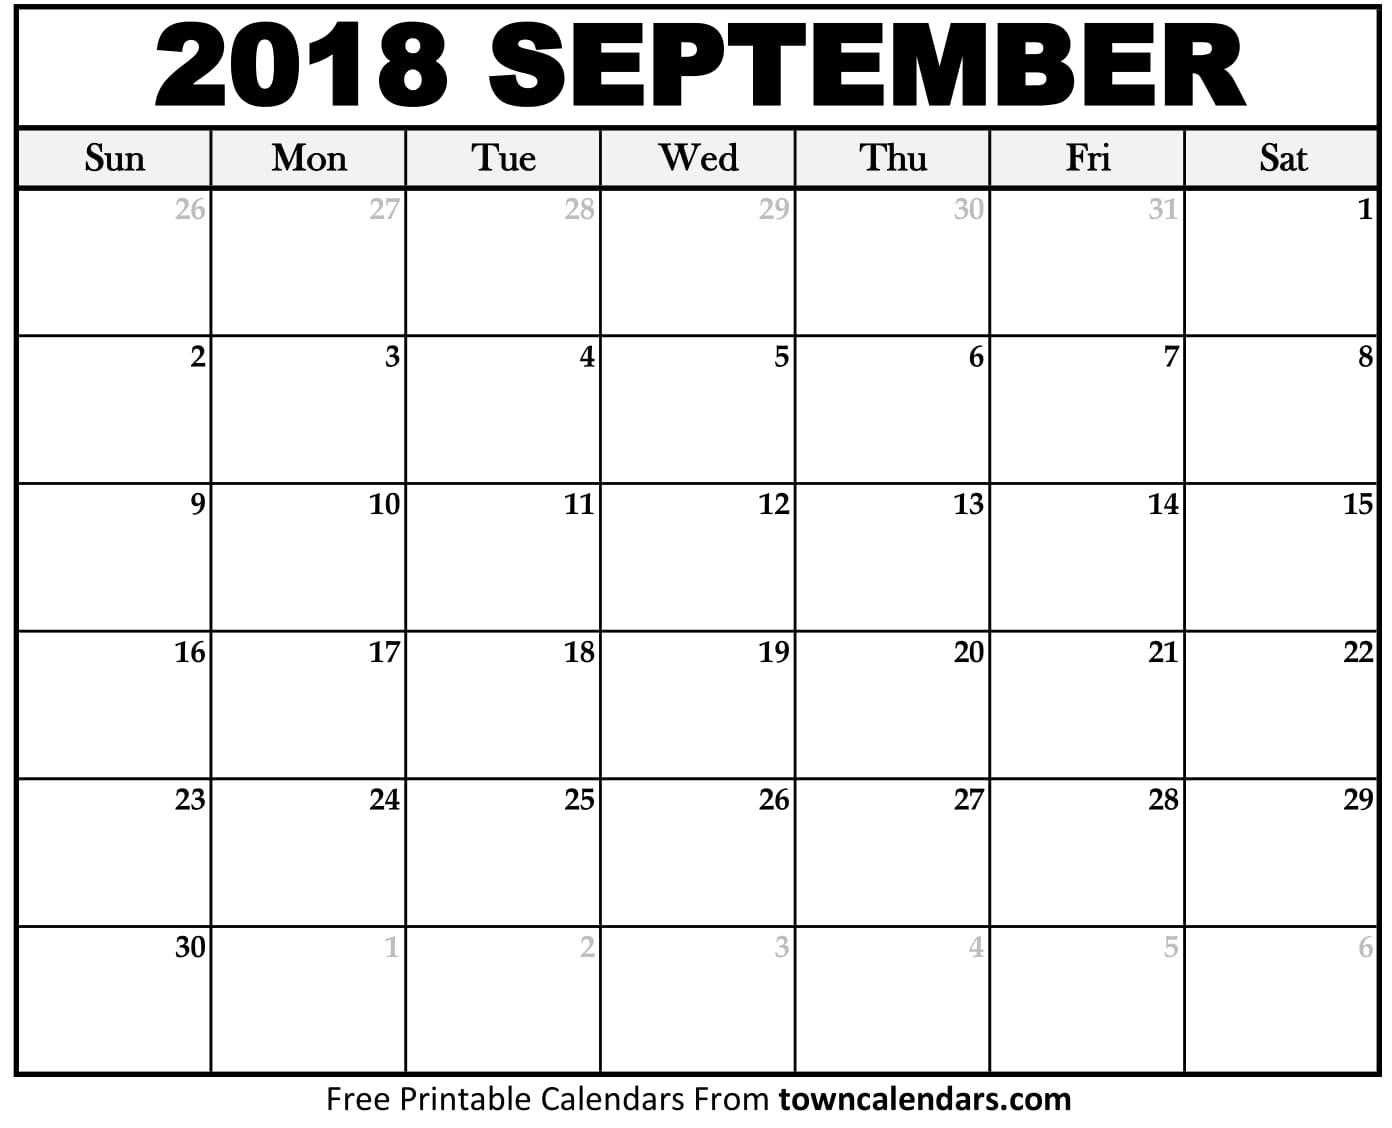 Calendar September 2018 Page